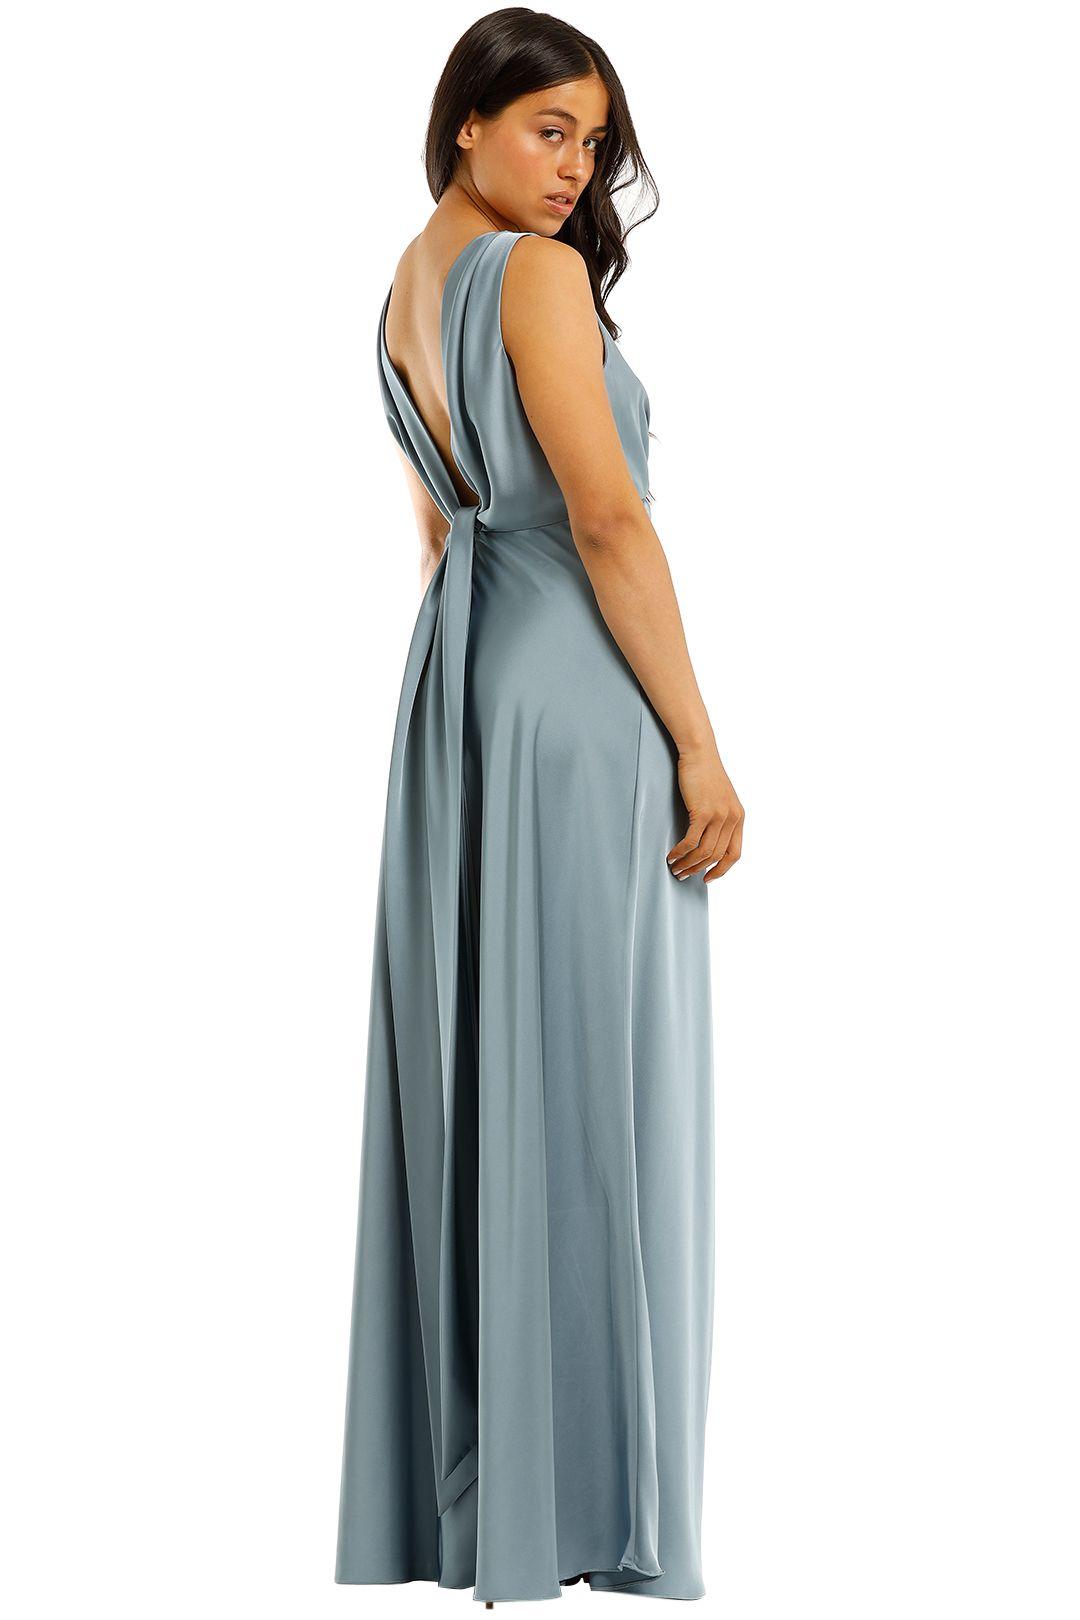 Jill-Jill-Stuart-Cross-Front-Gown-Back